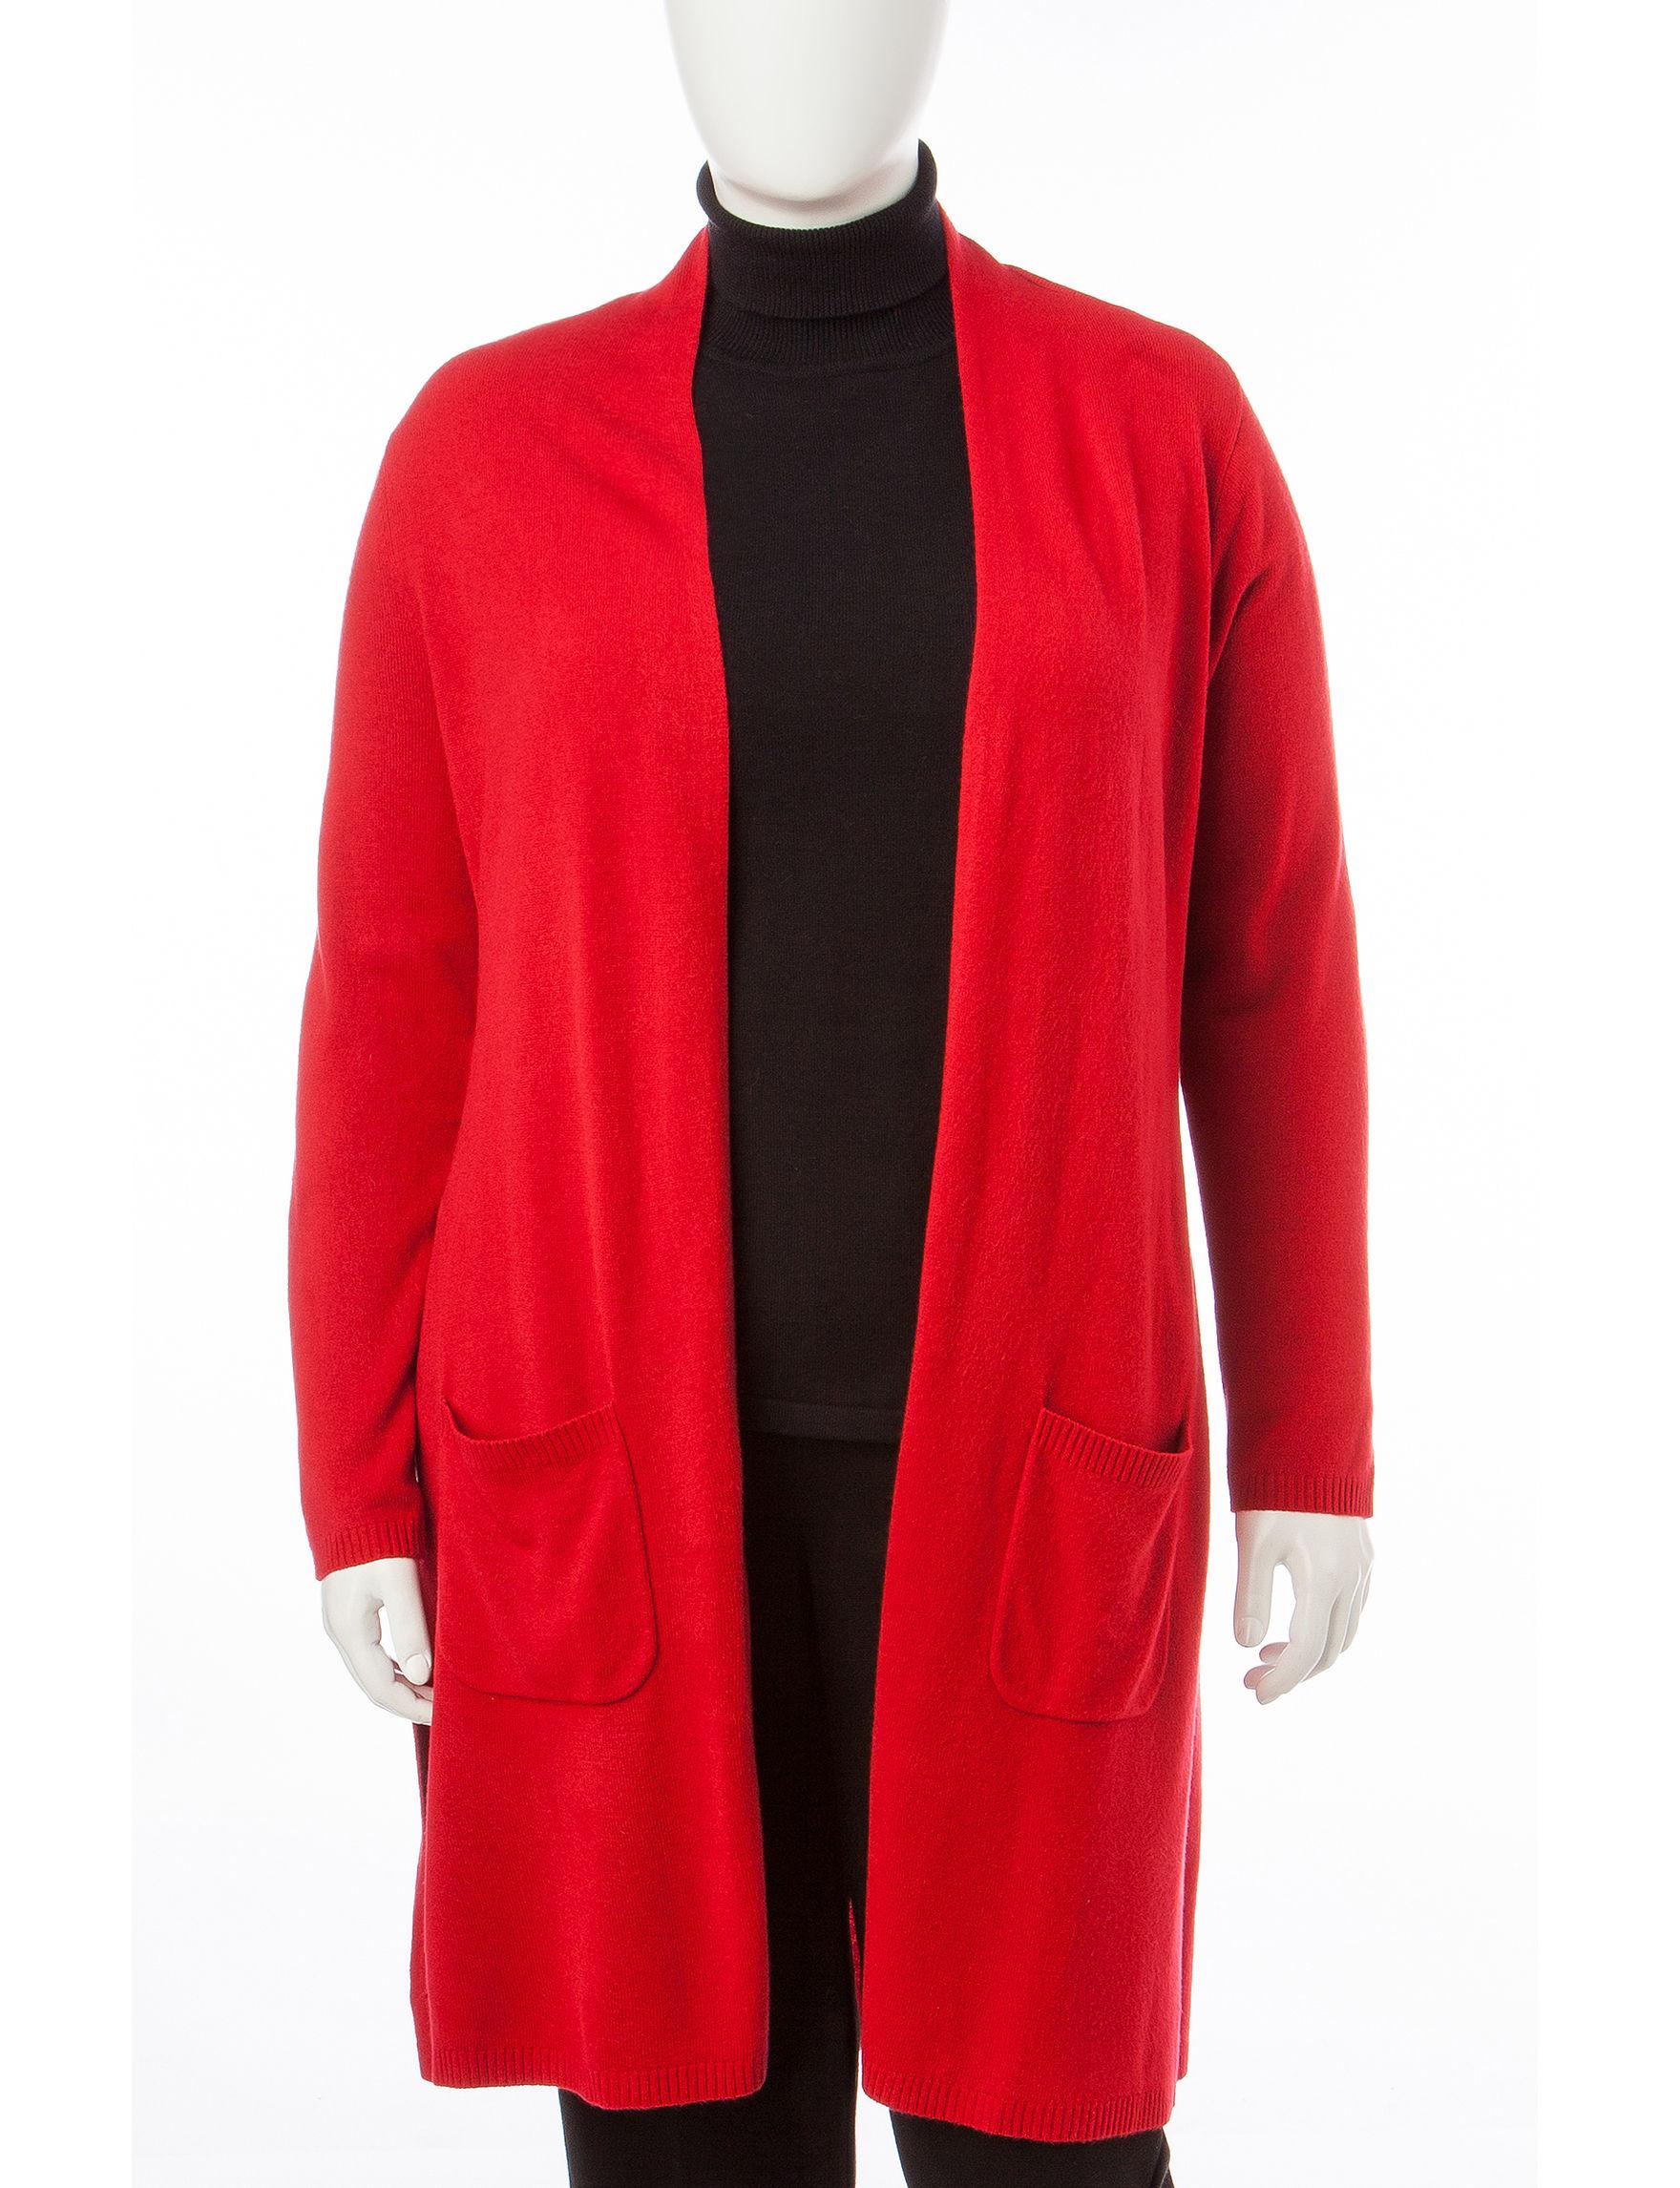 Rebecca Malone Red Cardigans Sweaters